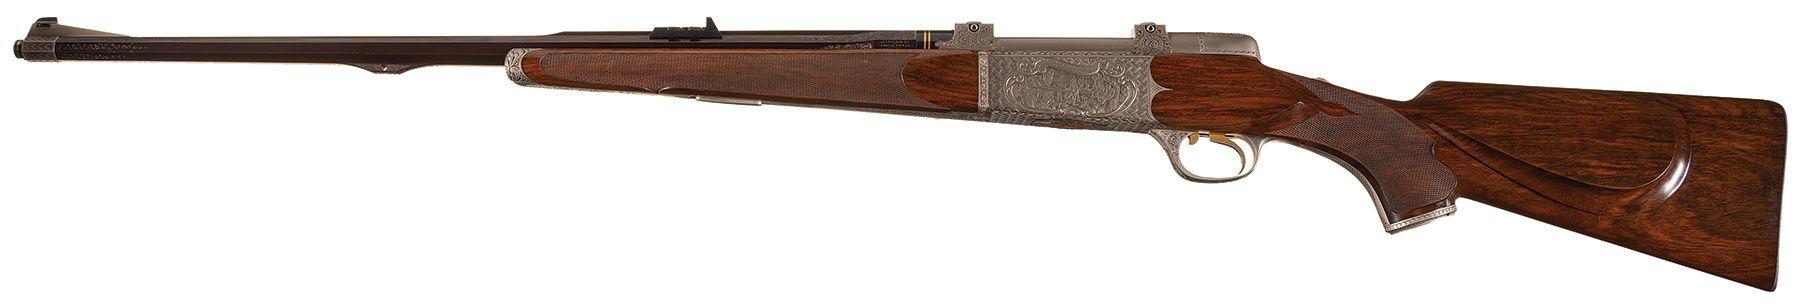 Haskins Rifle Company Bicentennial Rifle